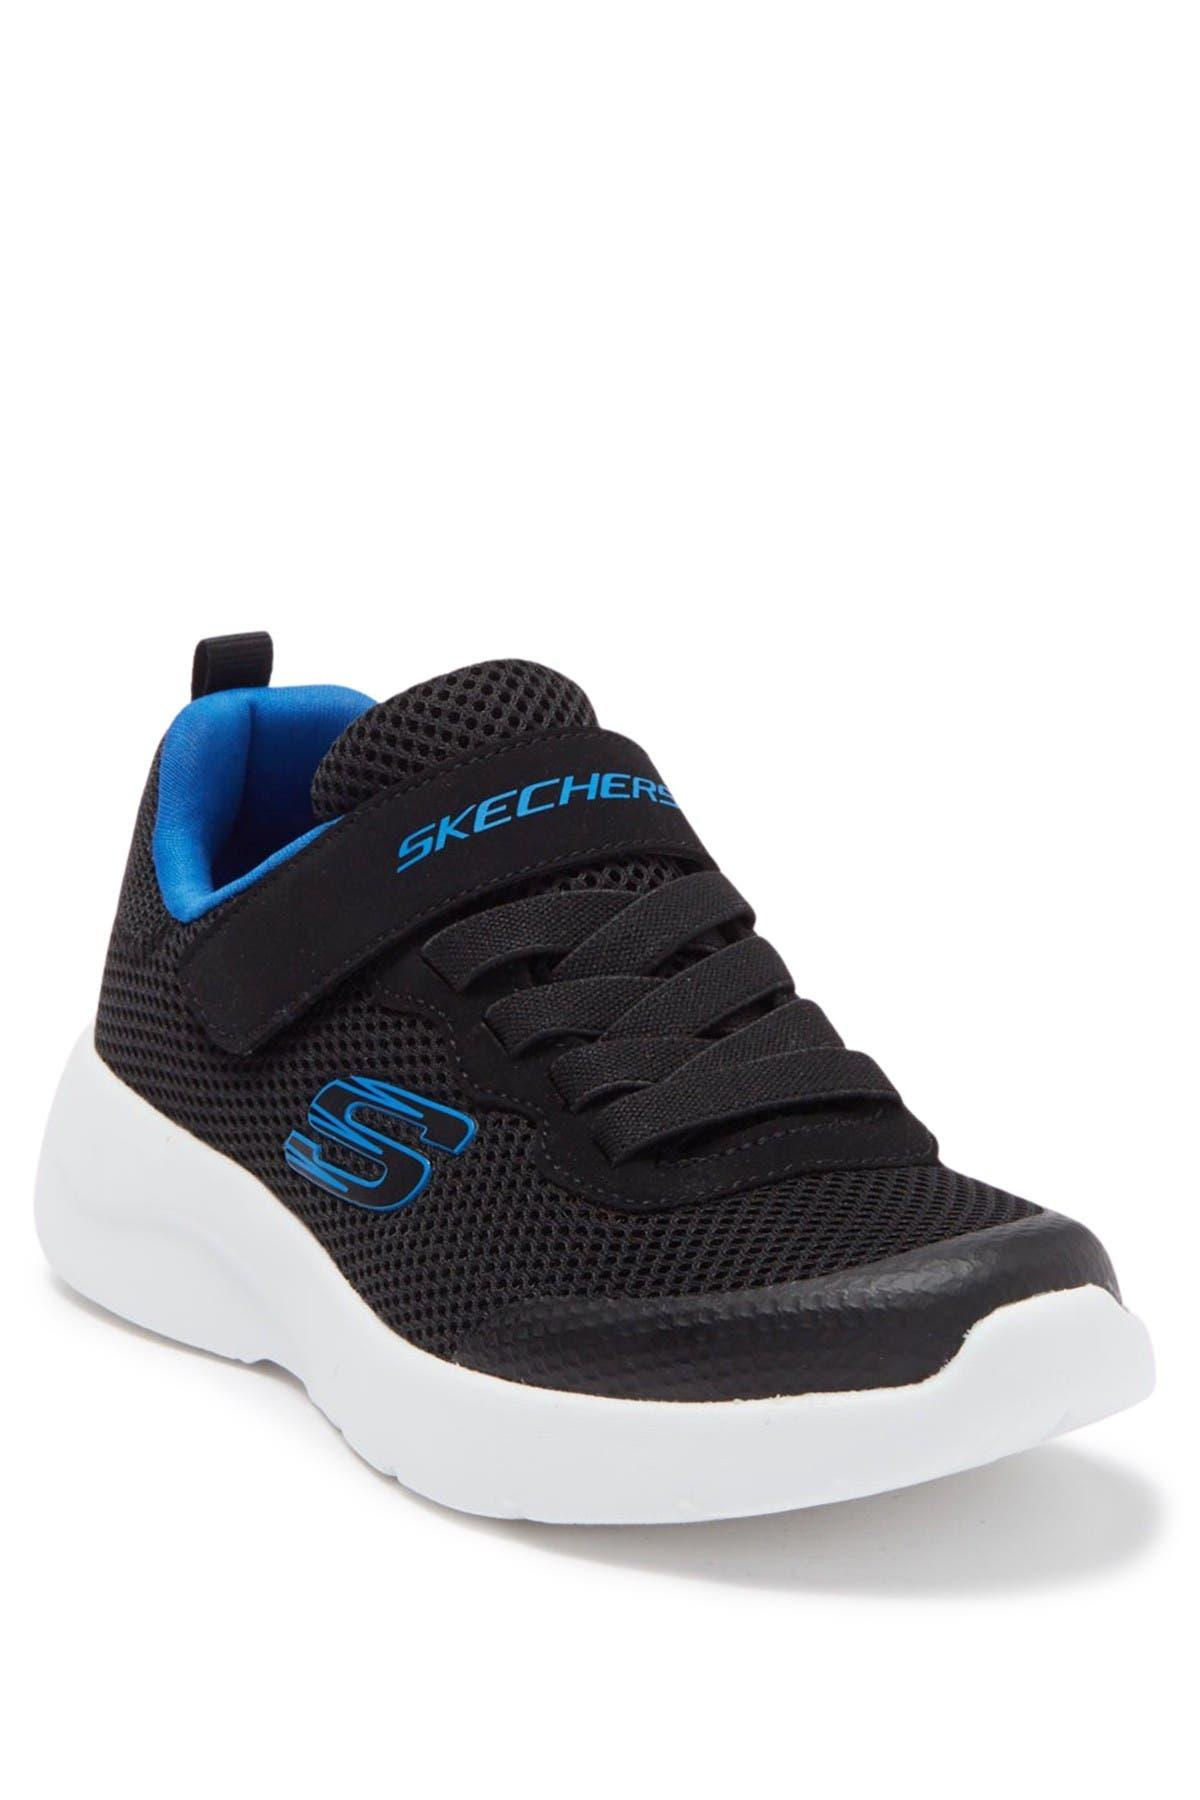 Image of Skechers Dynamight 2.0 Vordix Sneaker